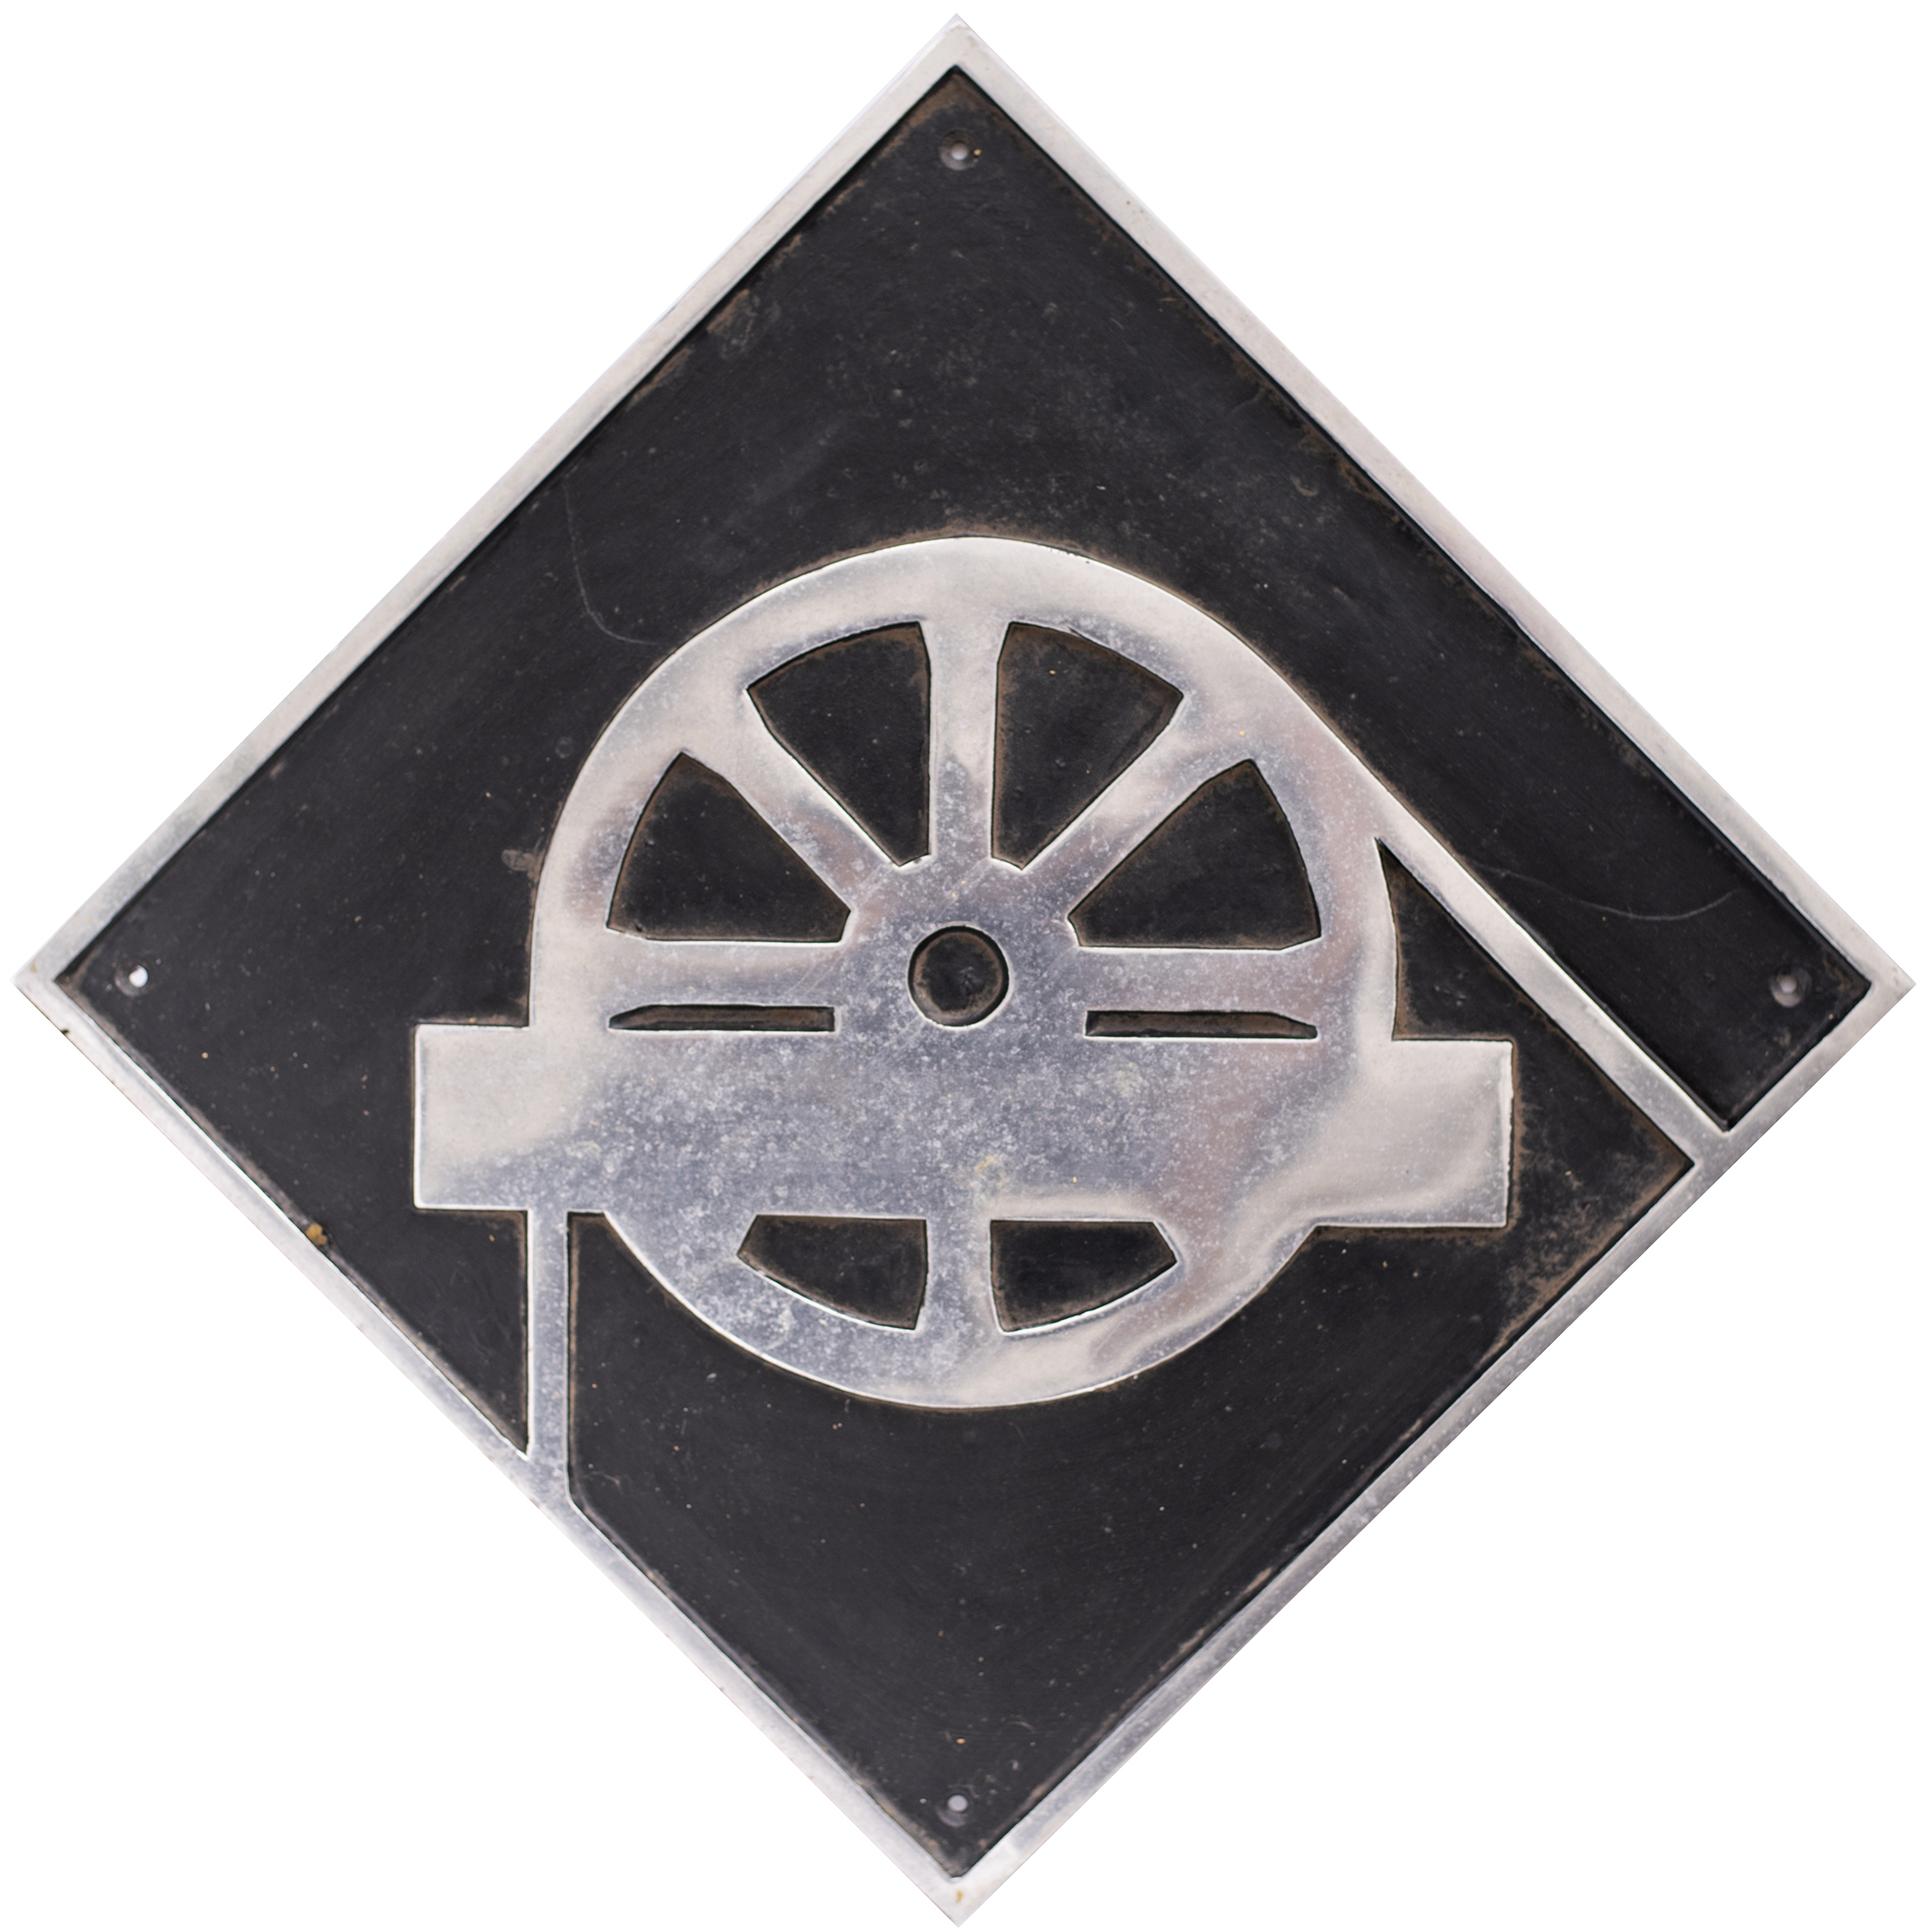 British Rail cast aluminium depot plaque for Knottingley depicting the Winding Wheel. Square cast